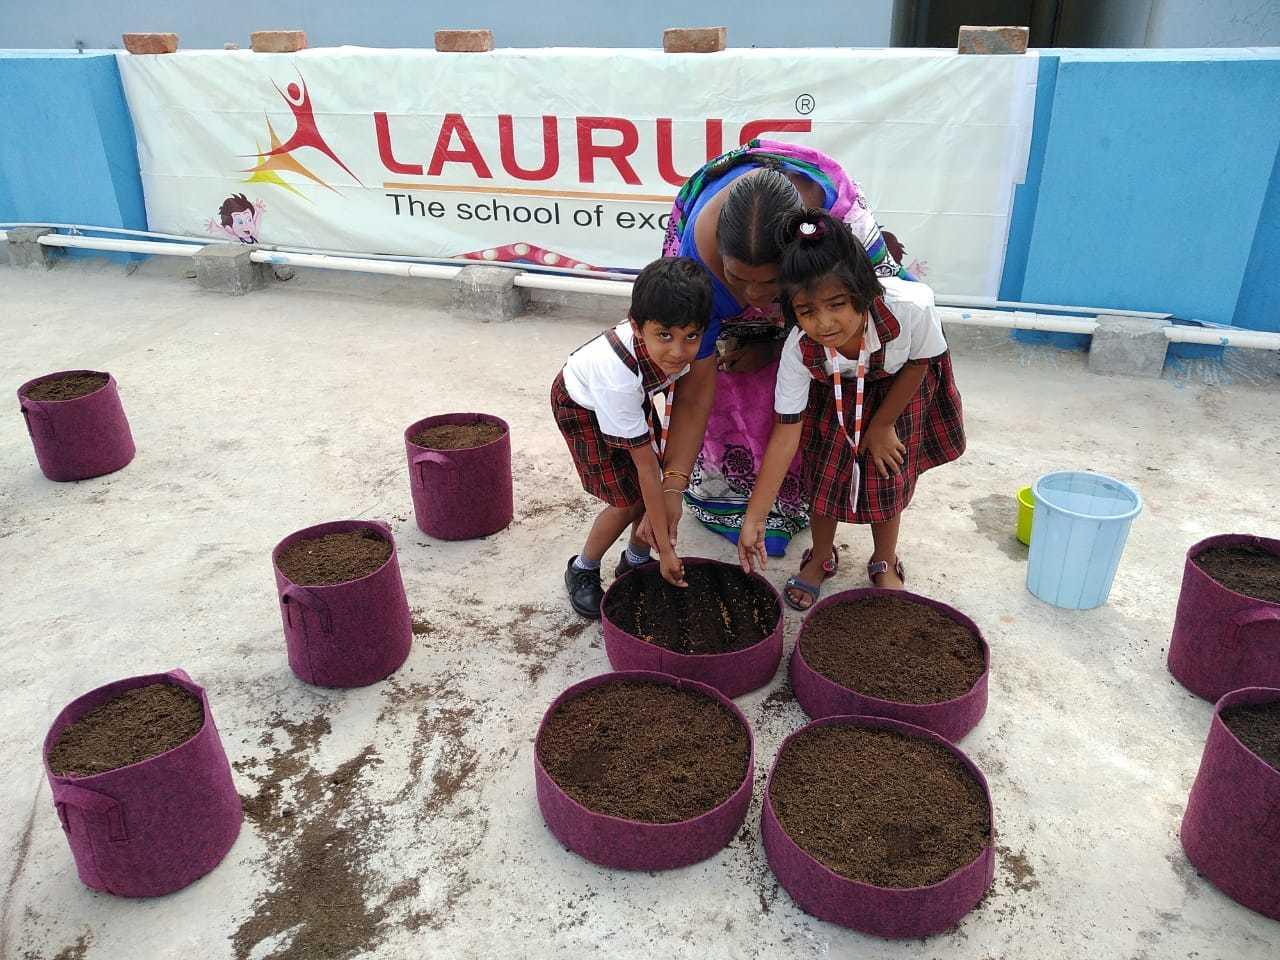 Laurus School Grows Their Own Vegetables With Homecrop